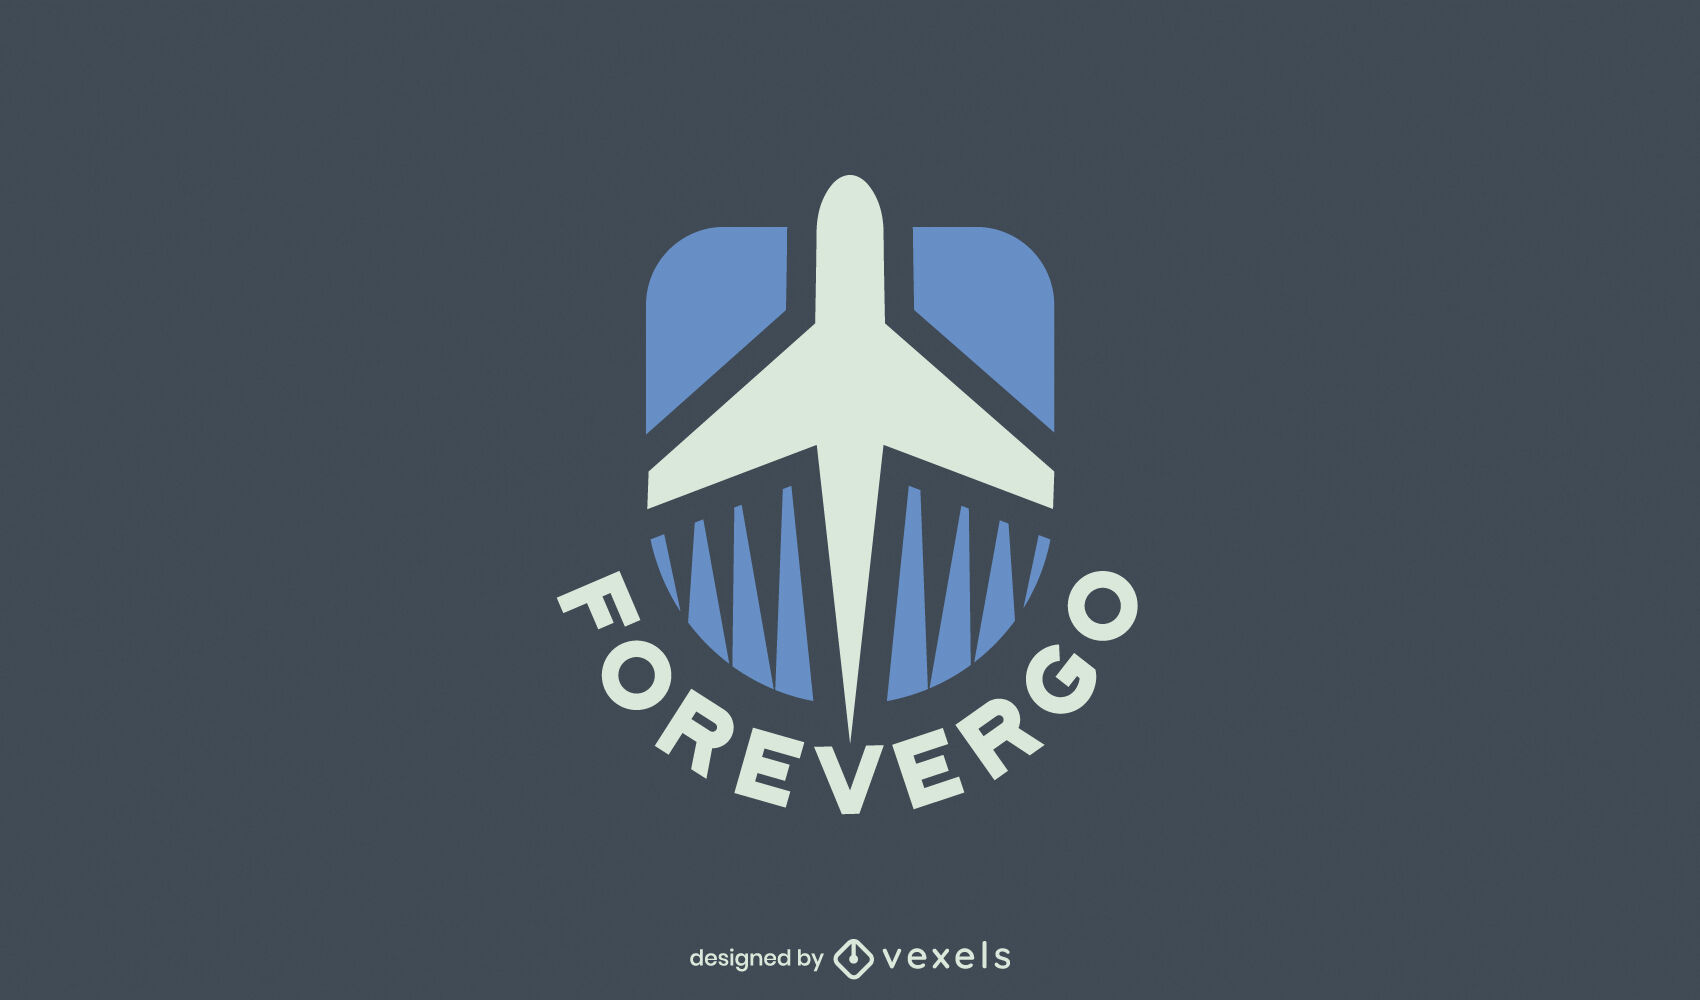 Great plane logo design